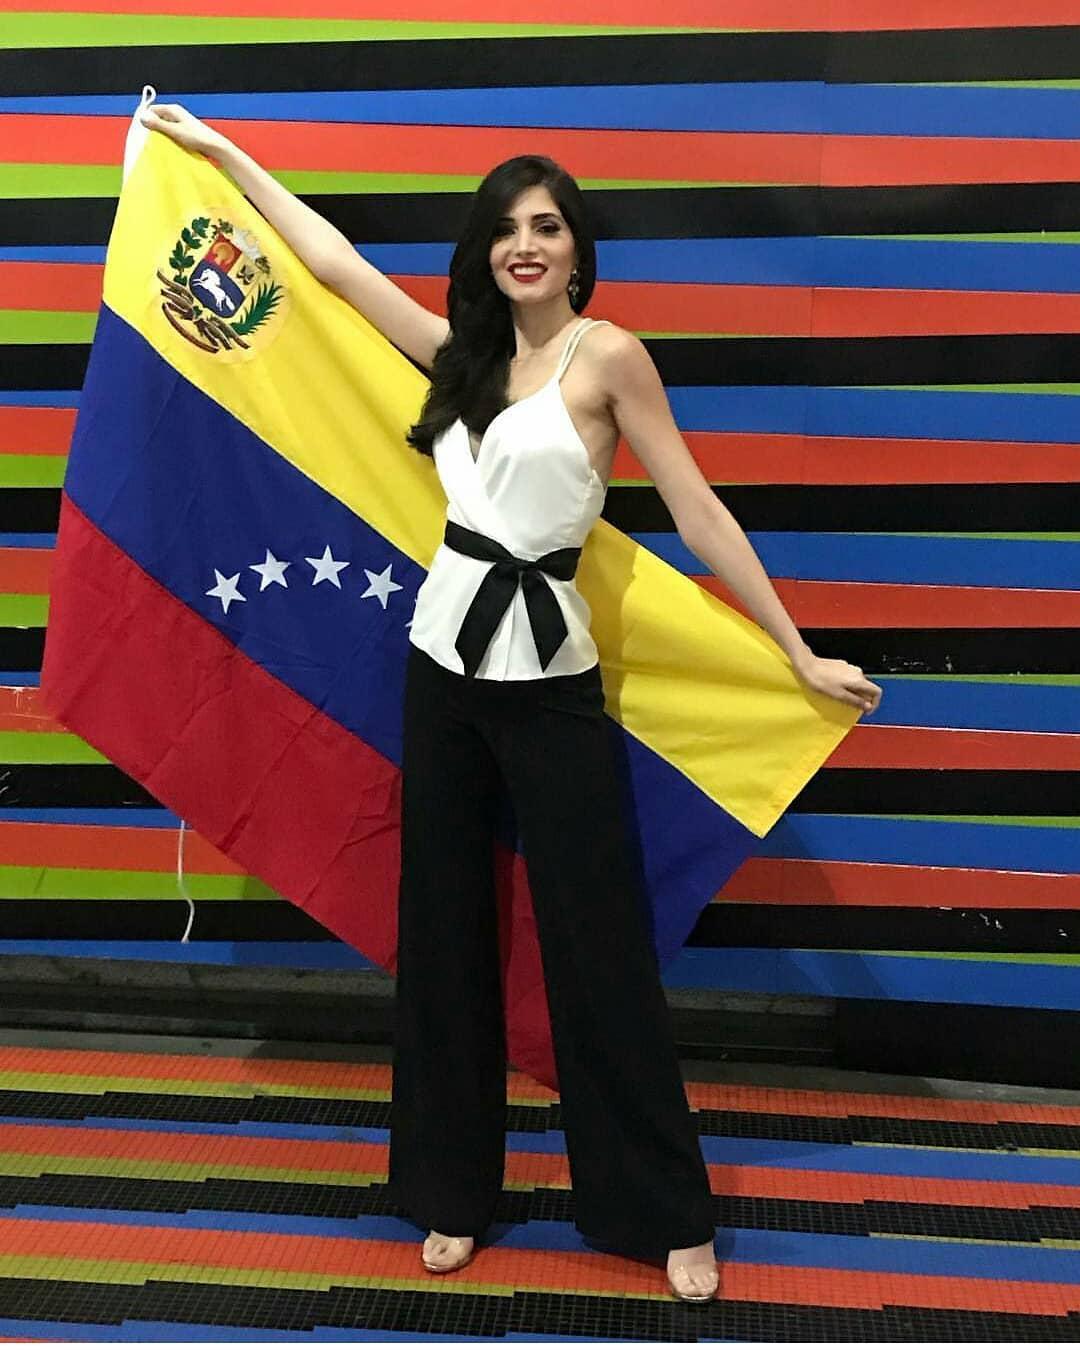 nariman battikha, reyna hispanoamericana 2018/top 10 de miss supranational 2018. - Página 2 42973110